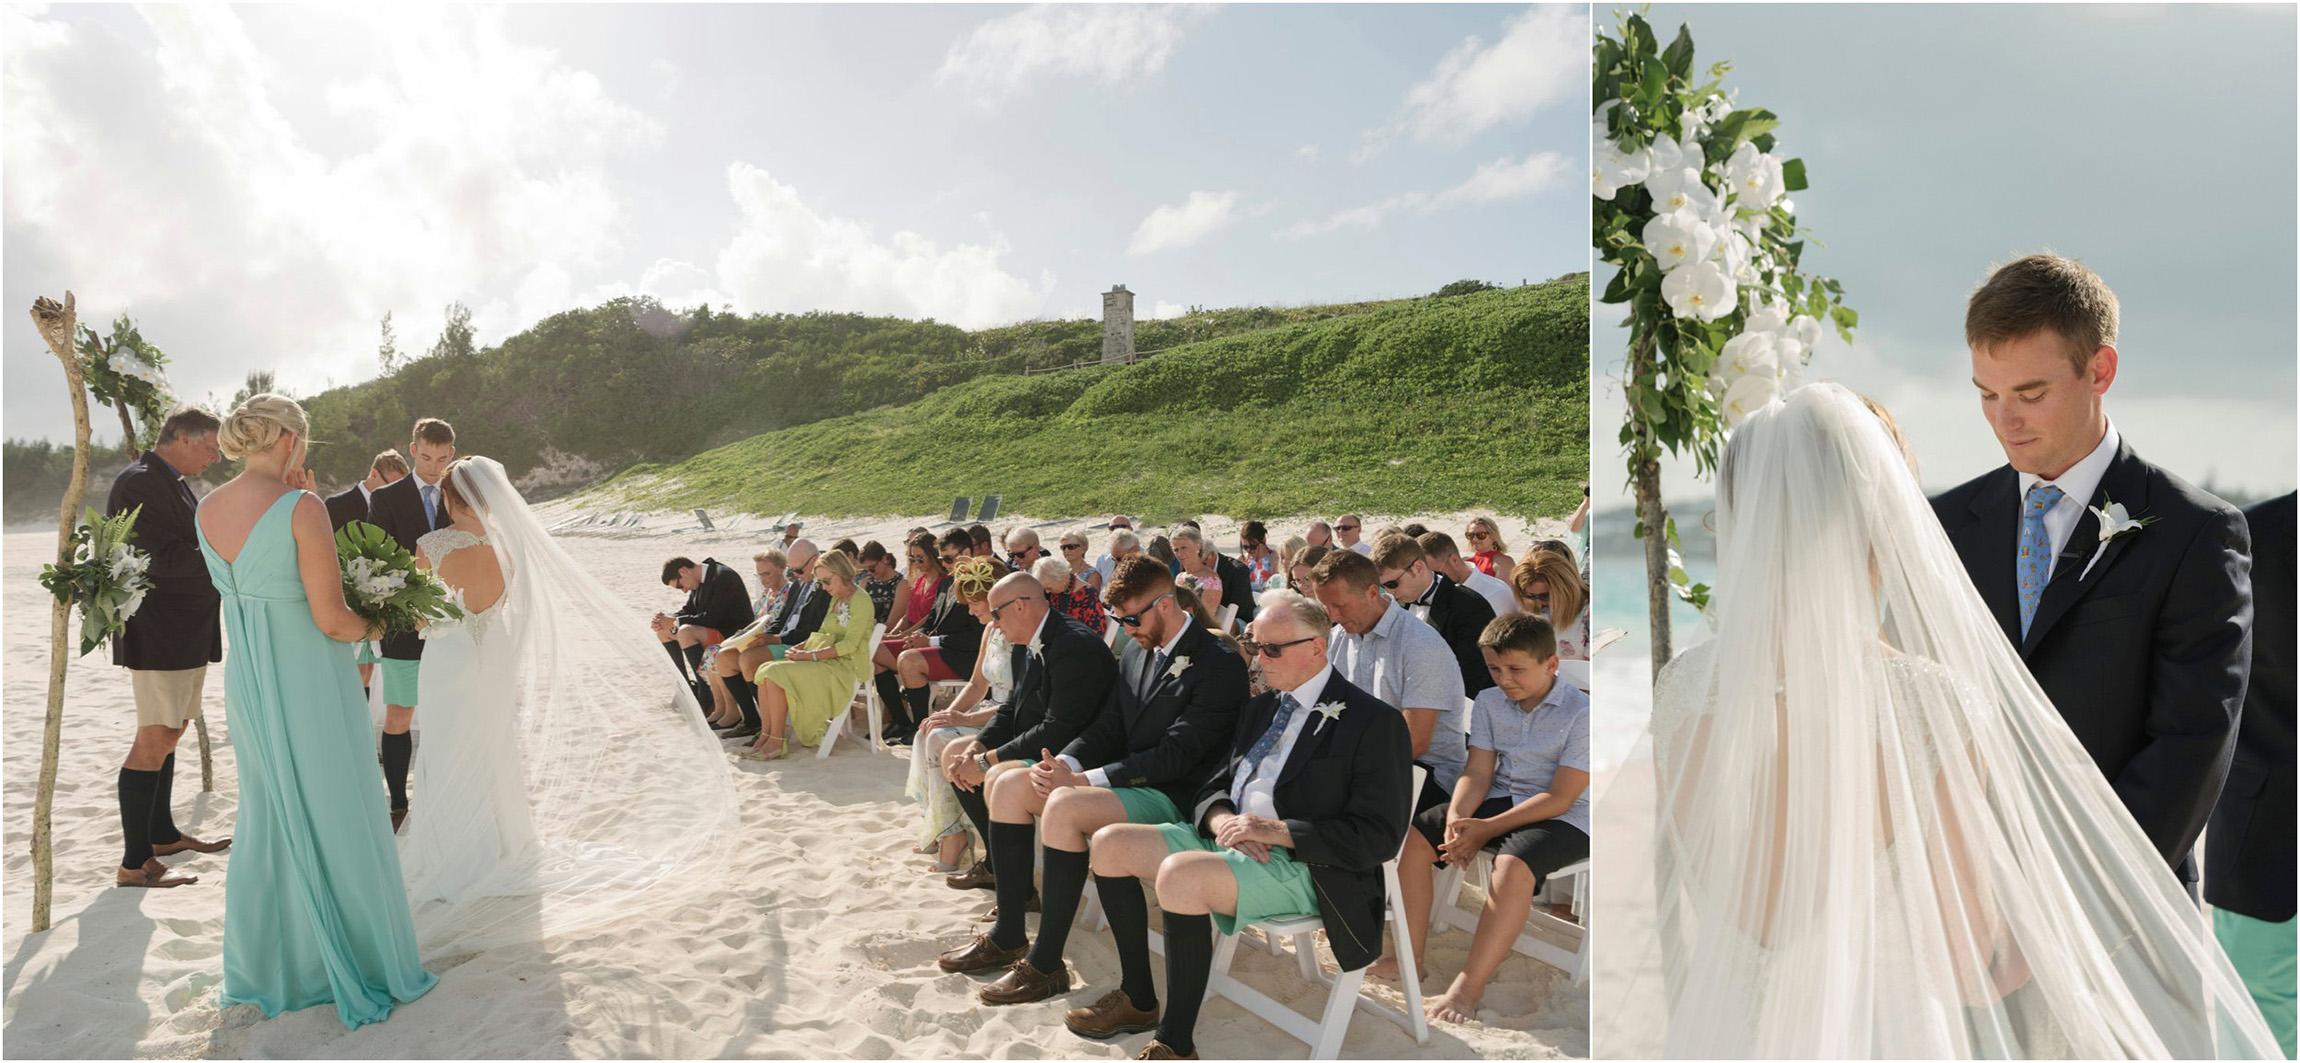 ©FianderFoto_Bermuda Wedding Photographer_Mid Ocean_Rachel_Angus_049.jpg